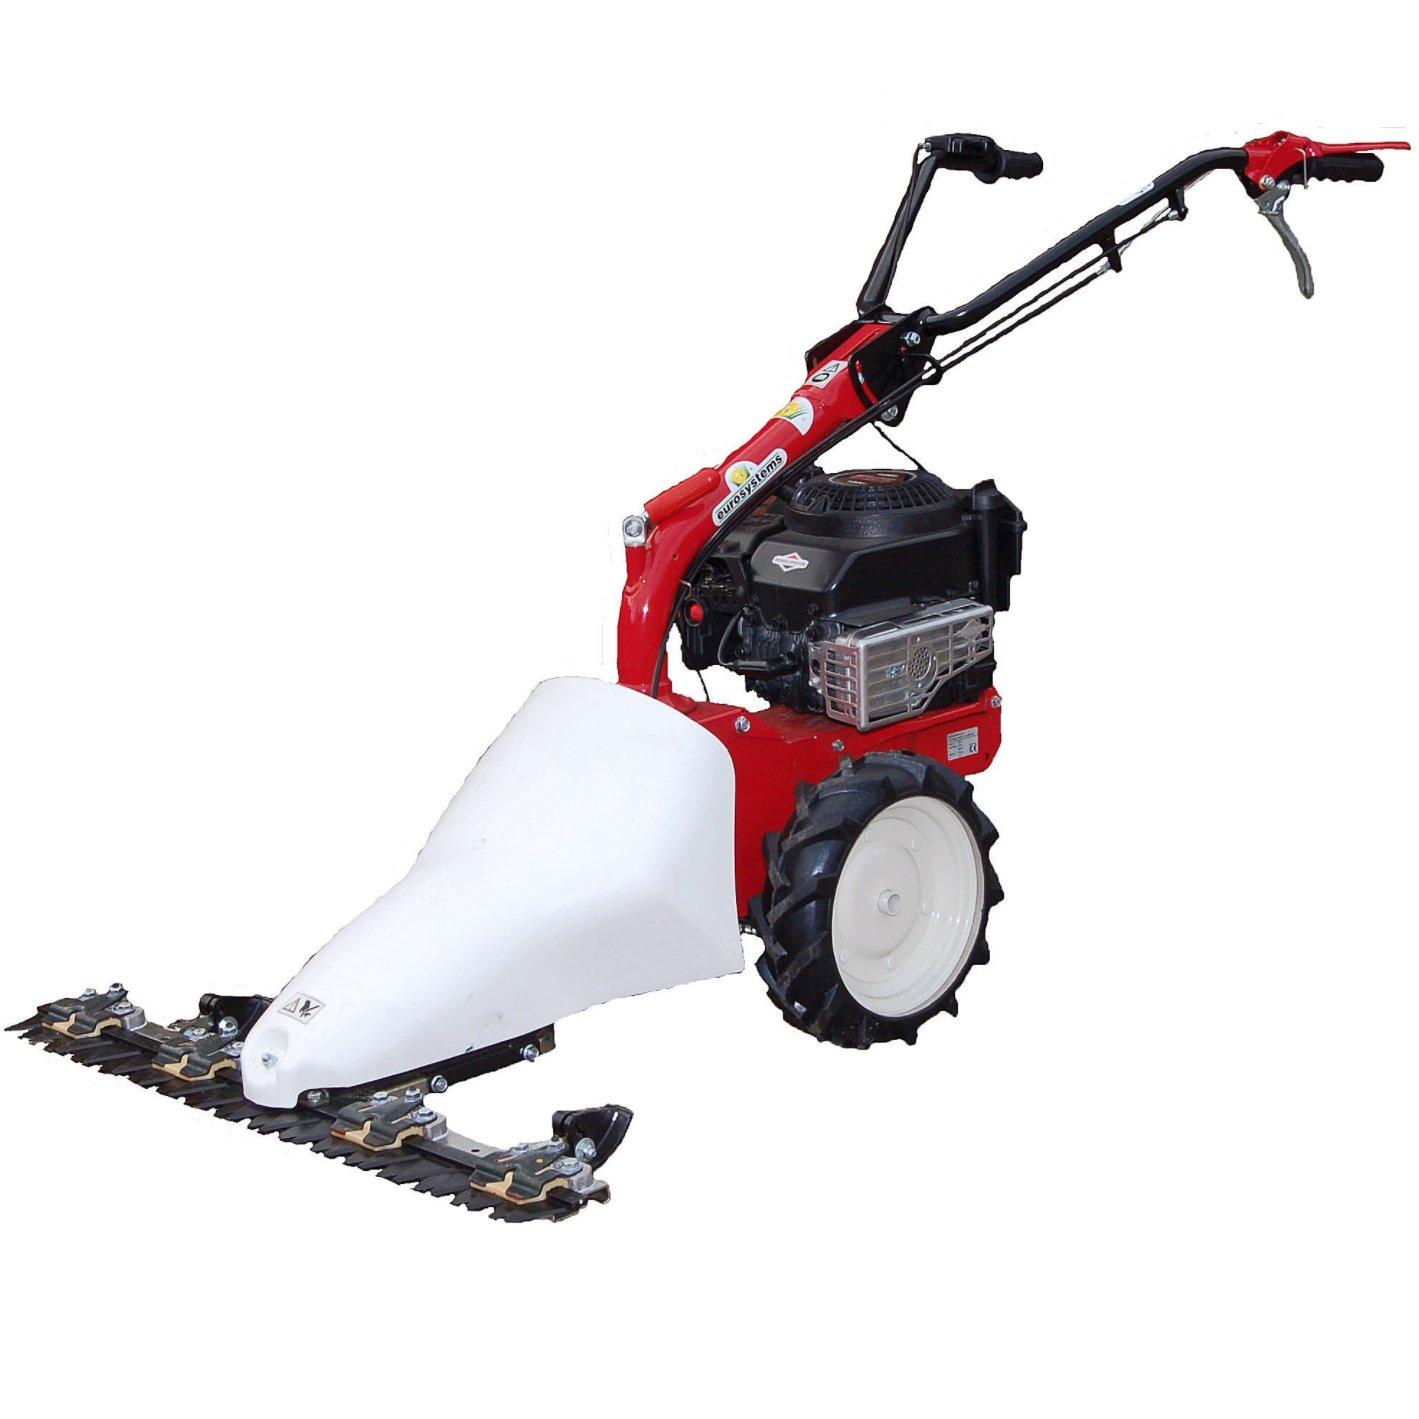 Apache m210 sickle bar scythe mower - Sickle bar mower for garden tractor ...